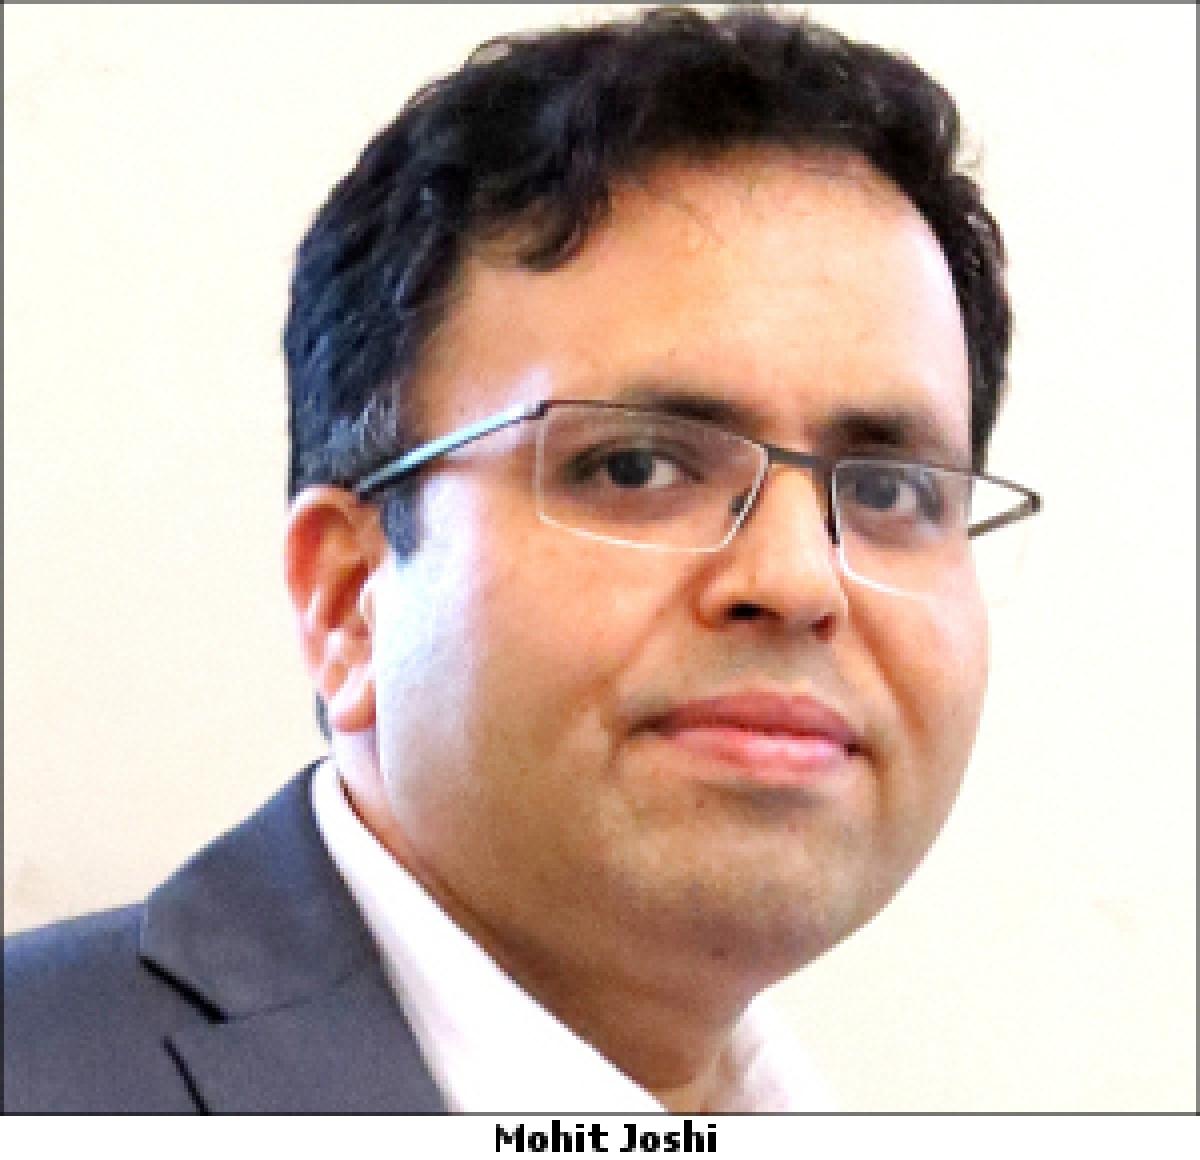 Amul, Cadbury and Google top meaningful brands in India: Havas Media Study